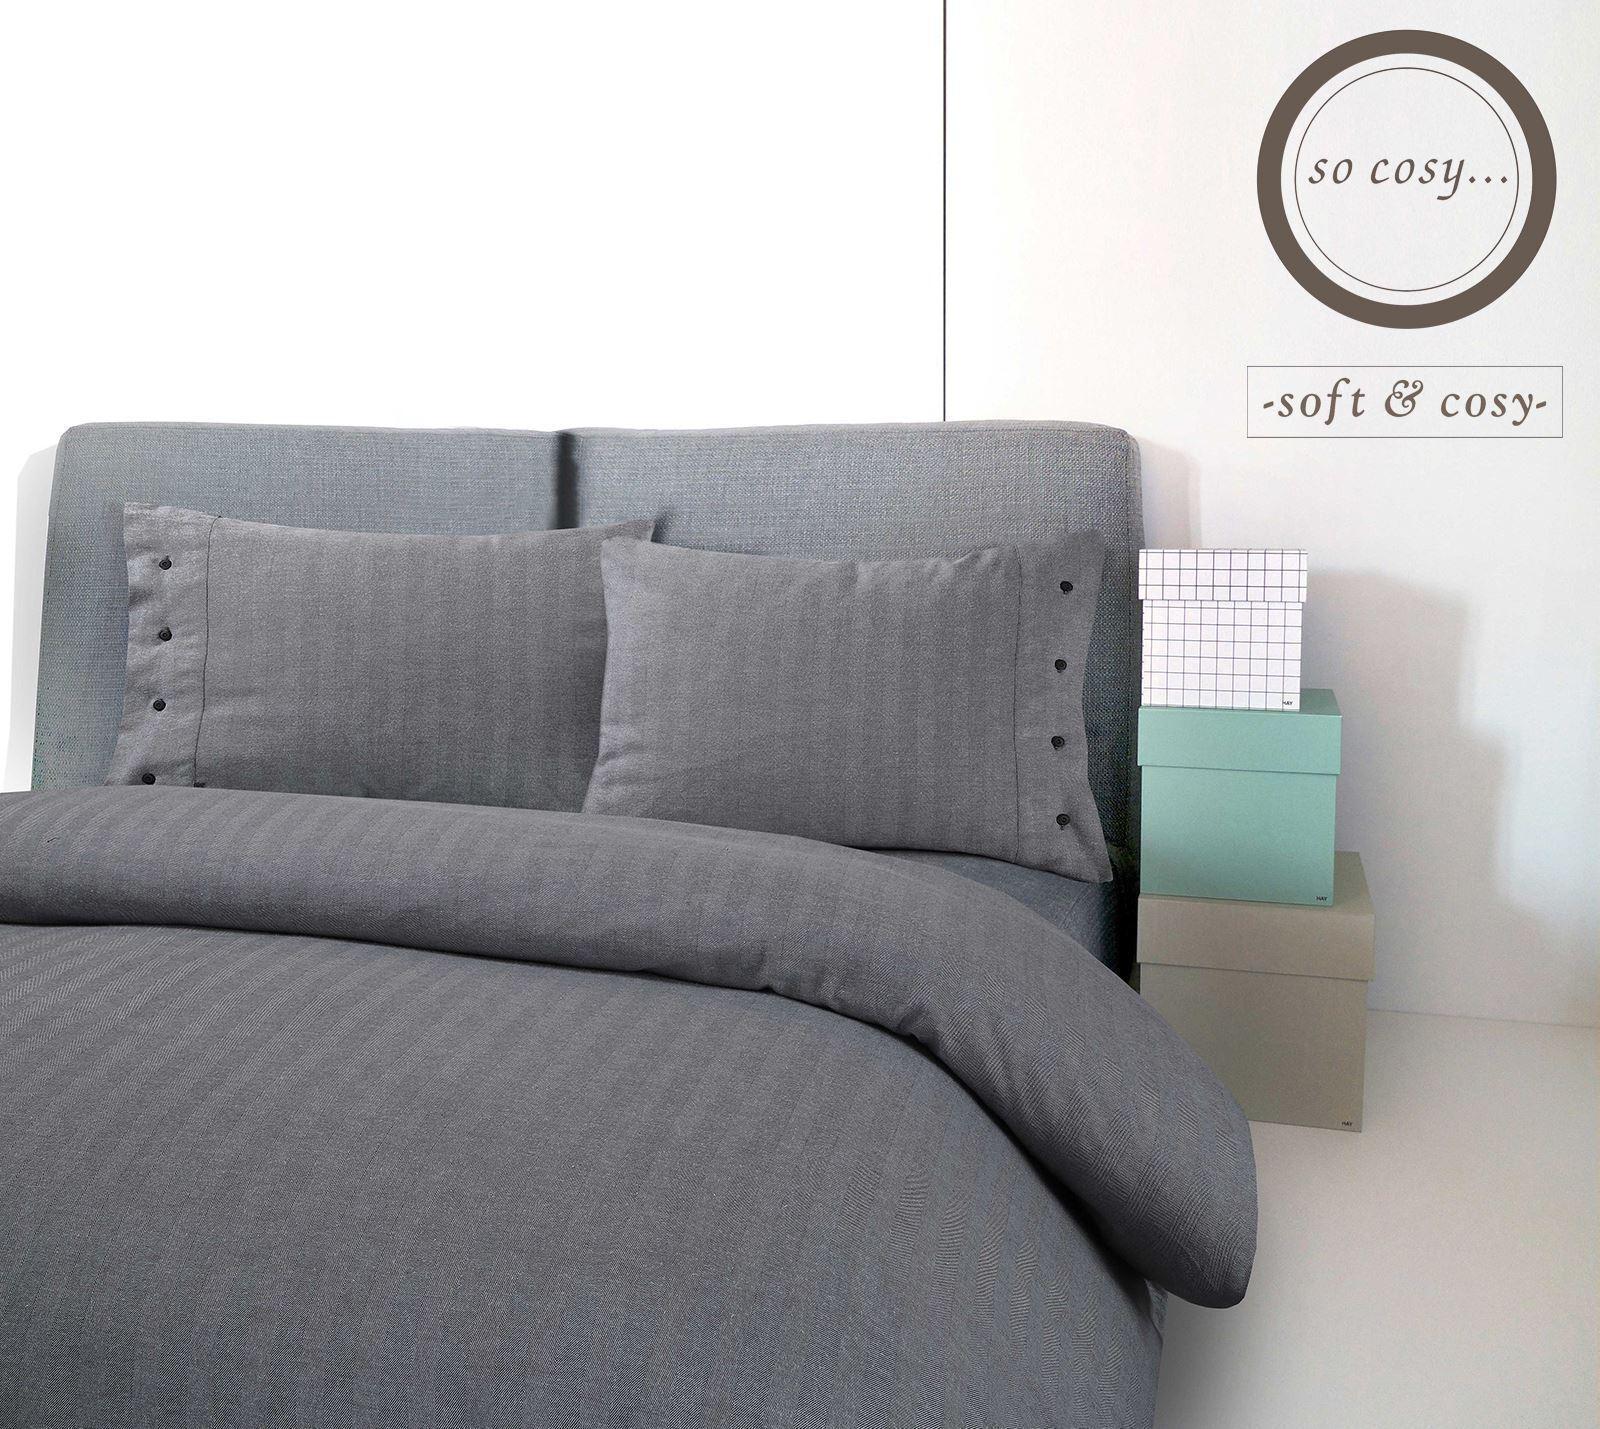 Herringbone Woven grau 100% Brushed Cotton Flannel Flannelette Duvet Cover Set